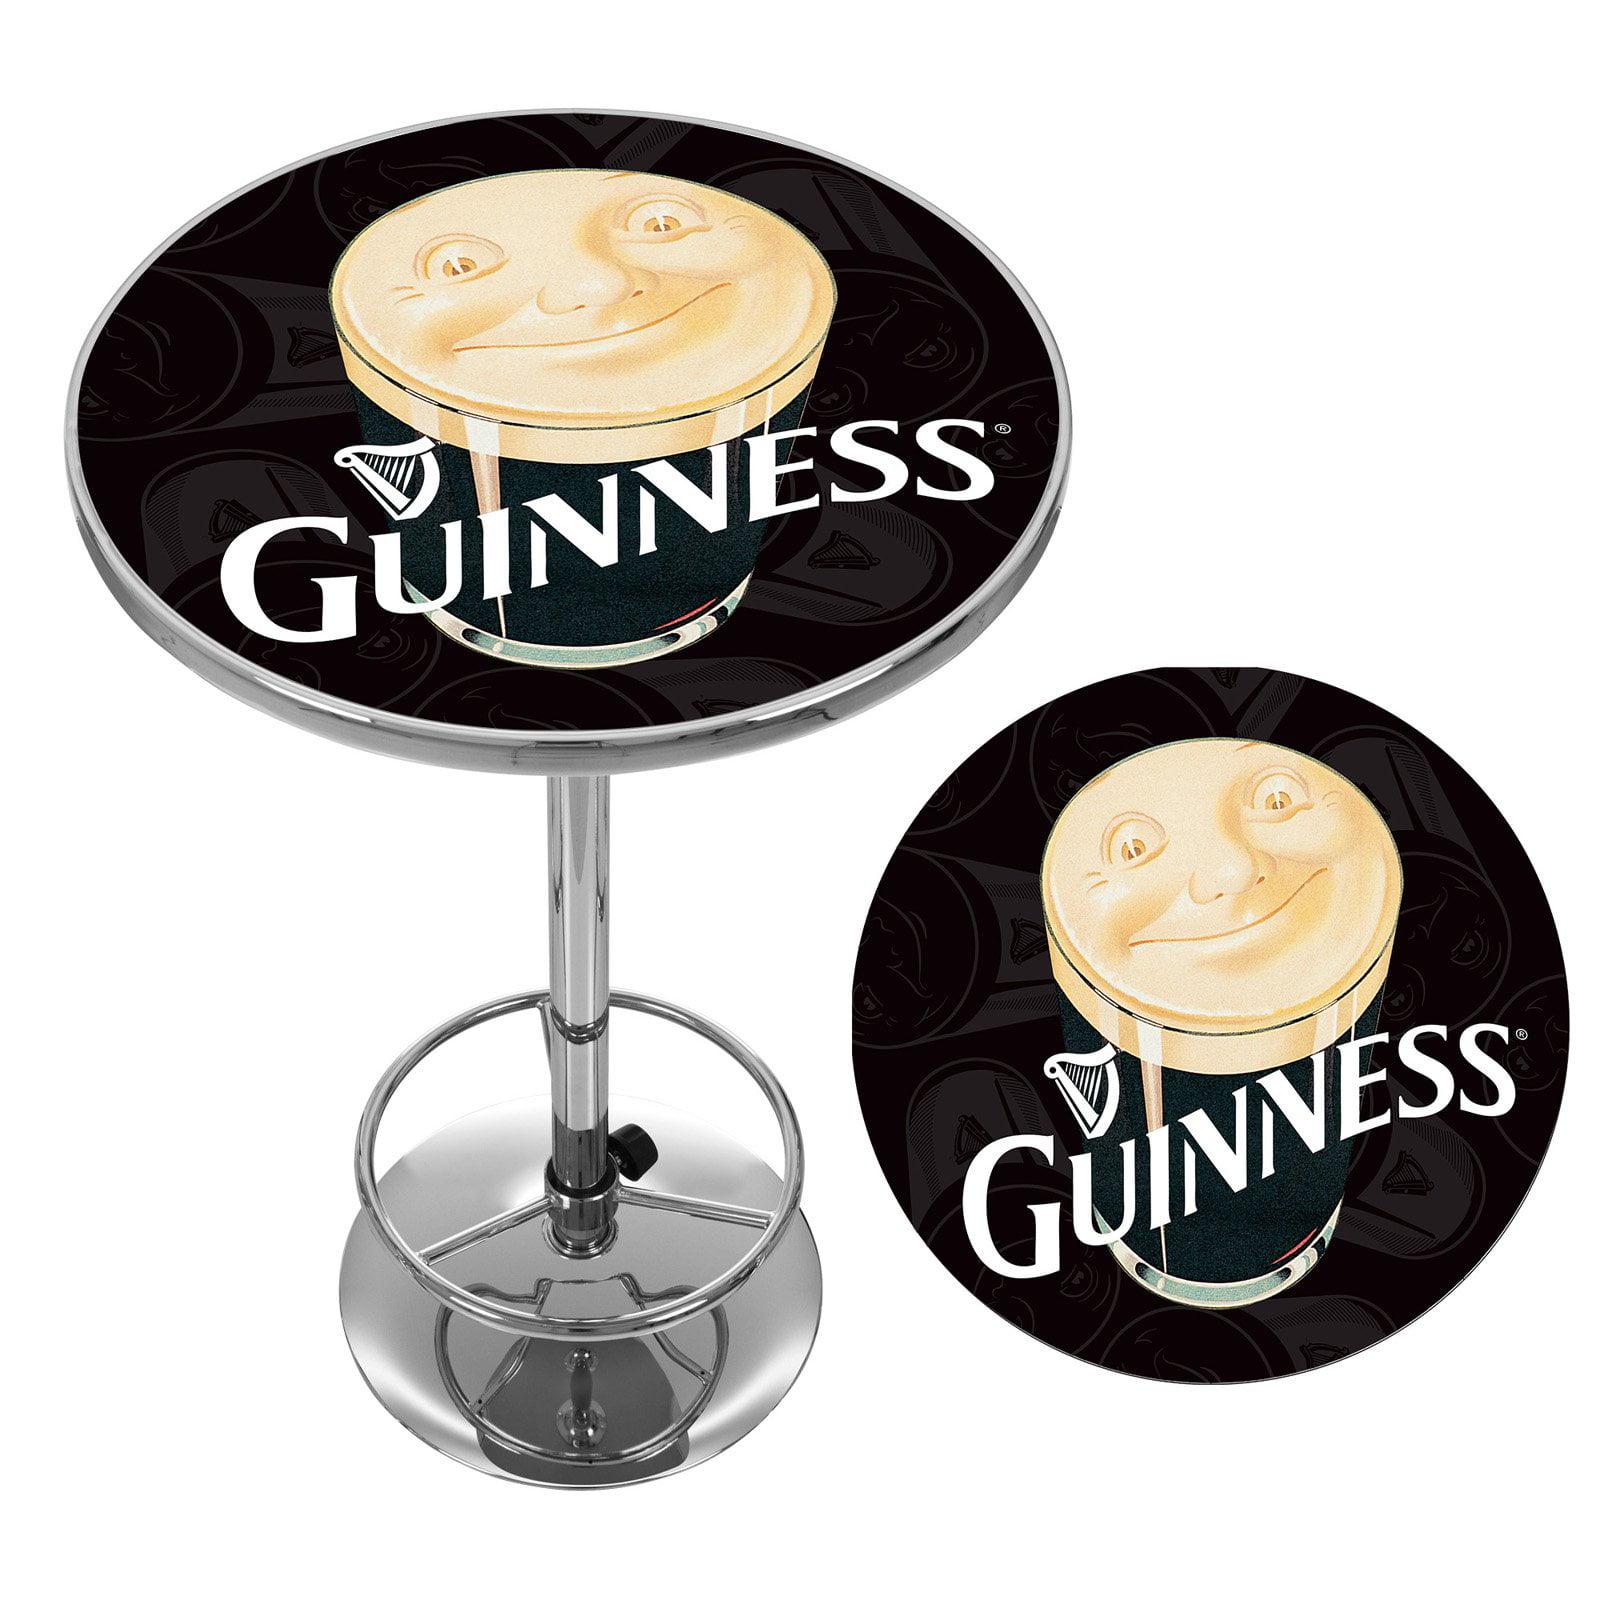 Guinness Chrome Pub Table by Trademark Global LLC